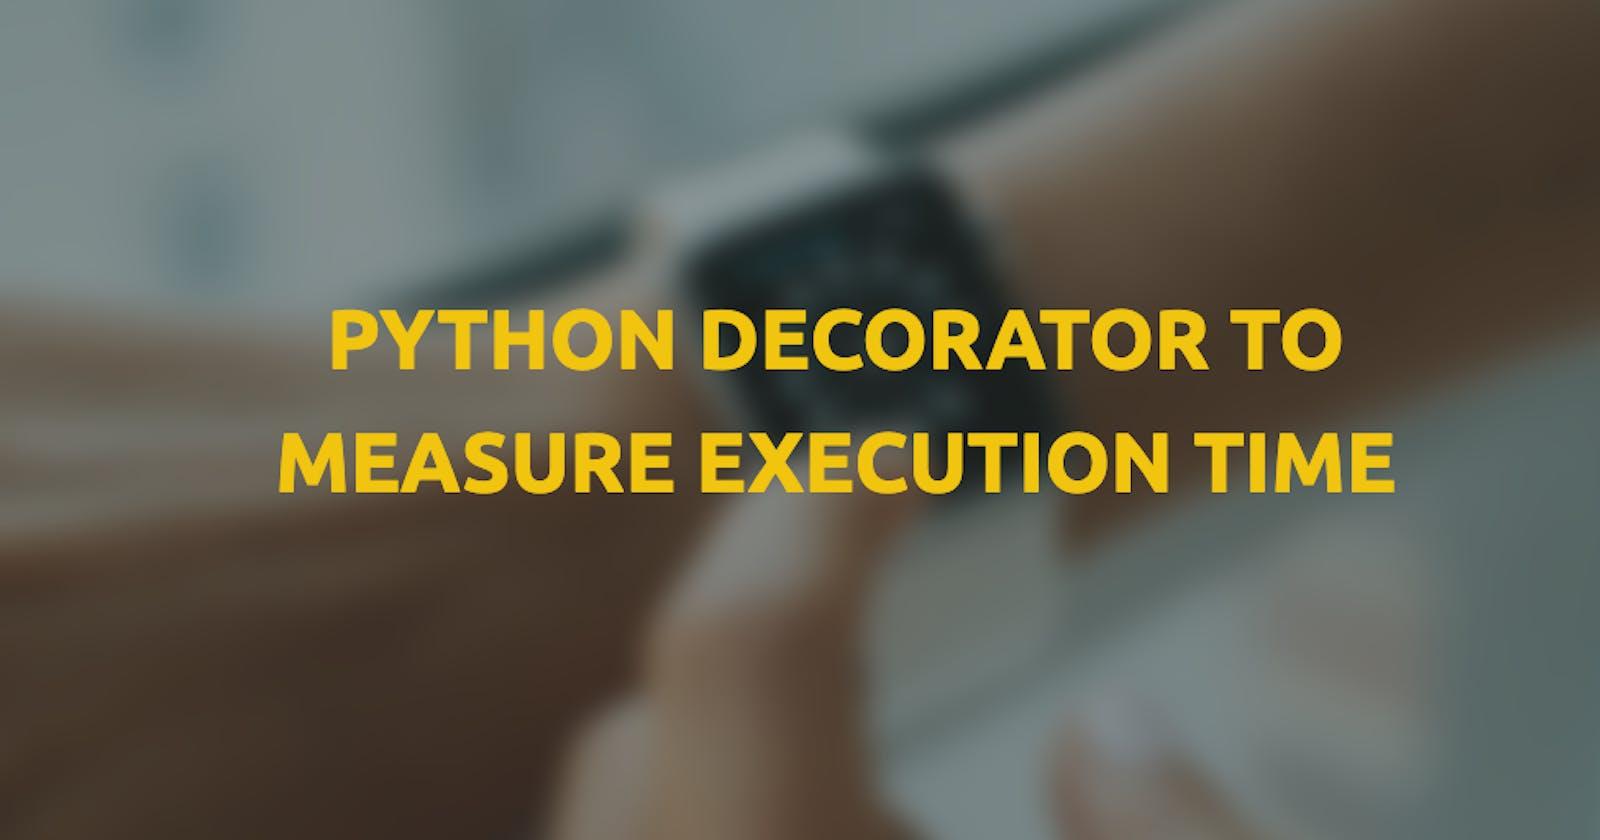 Python decorator to measure execution time